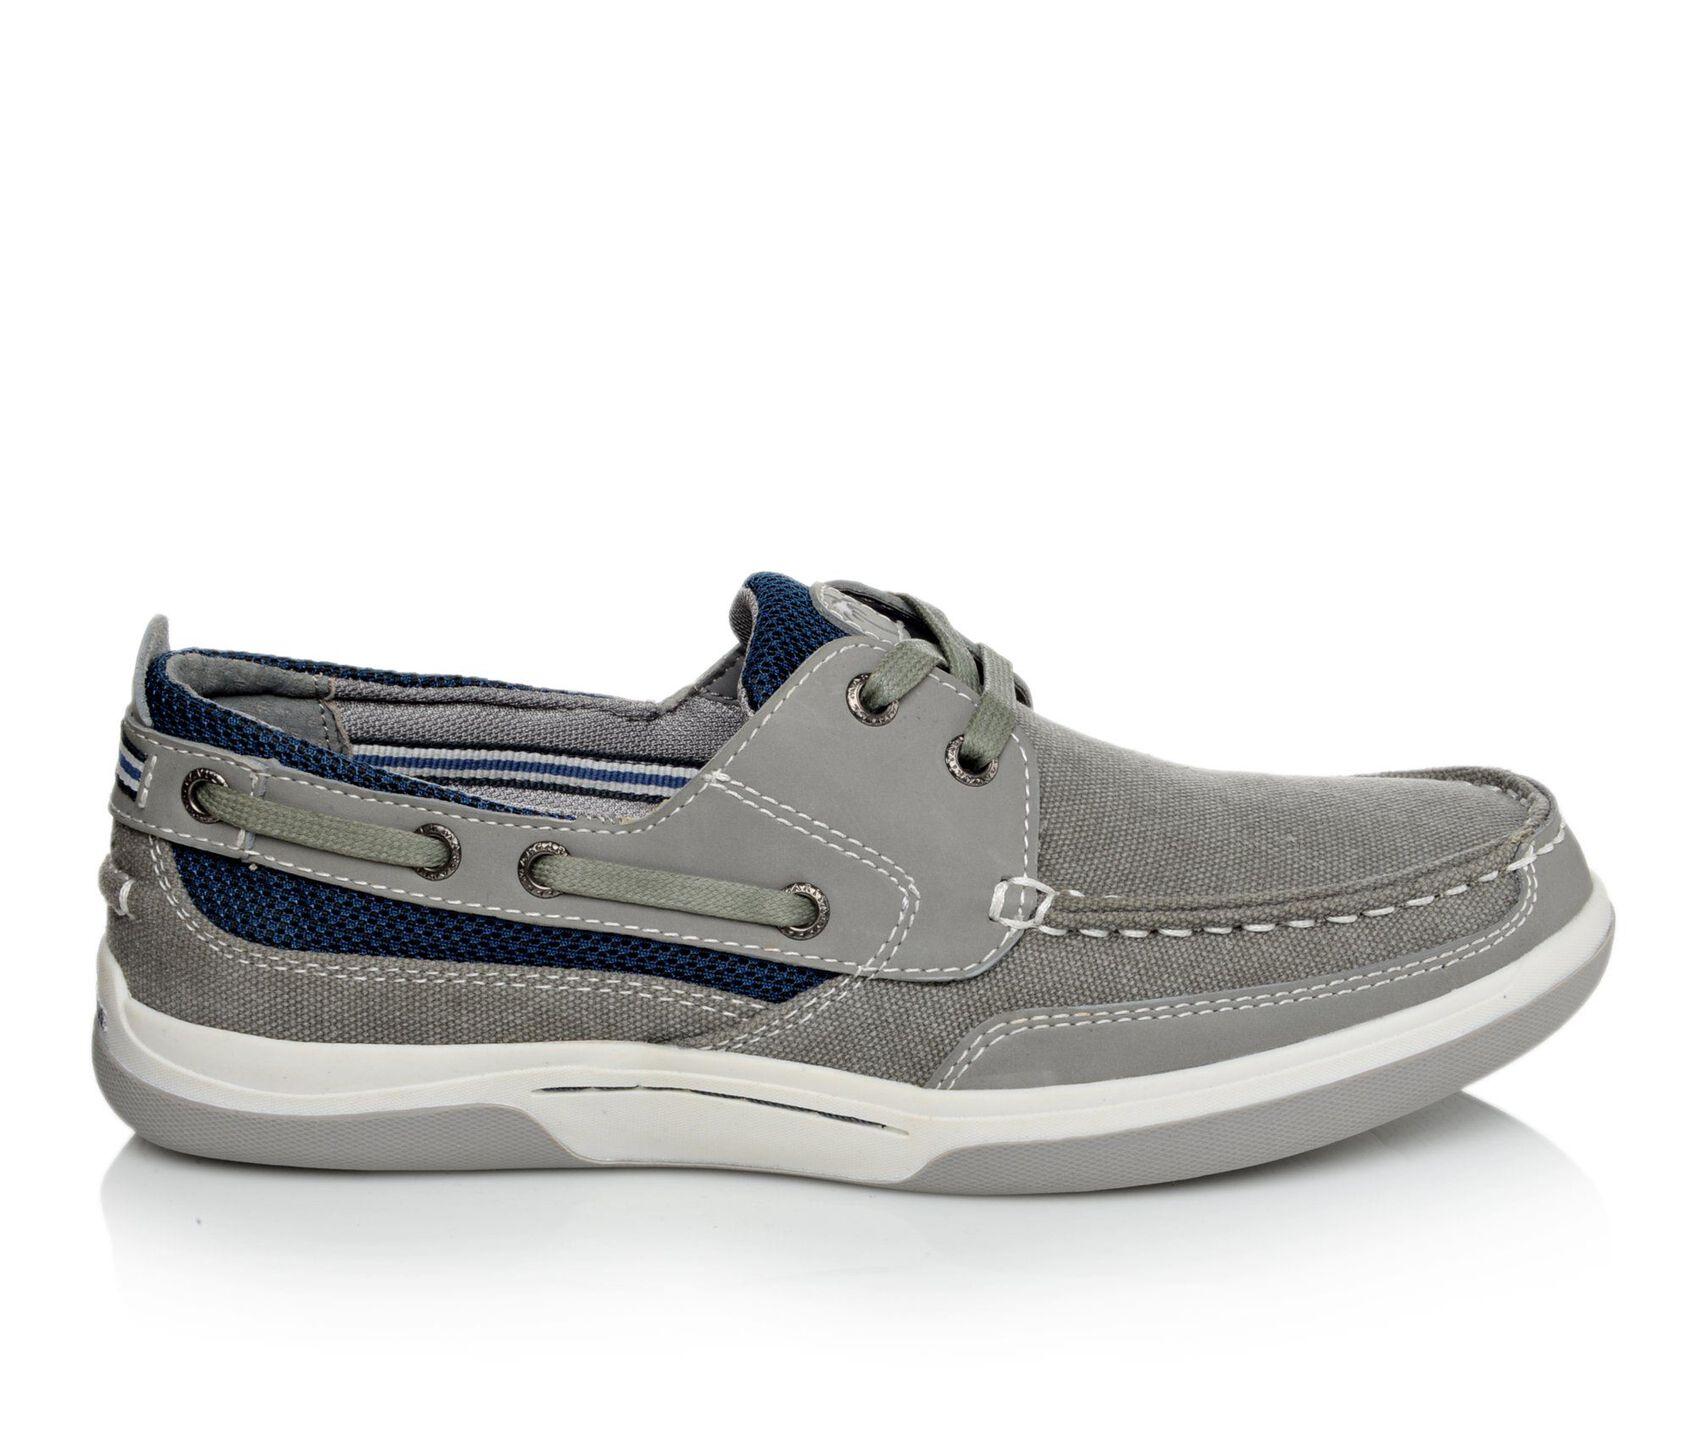 s margaritaville harpoon canvas boat shoes